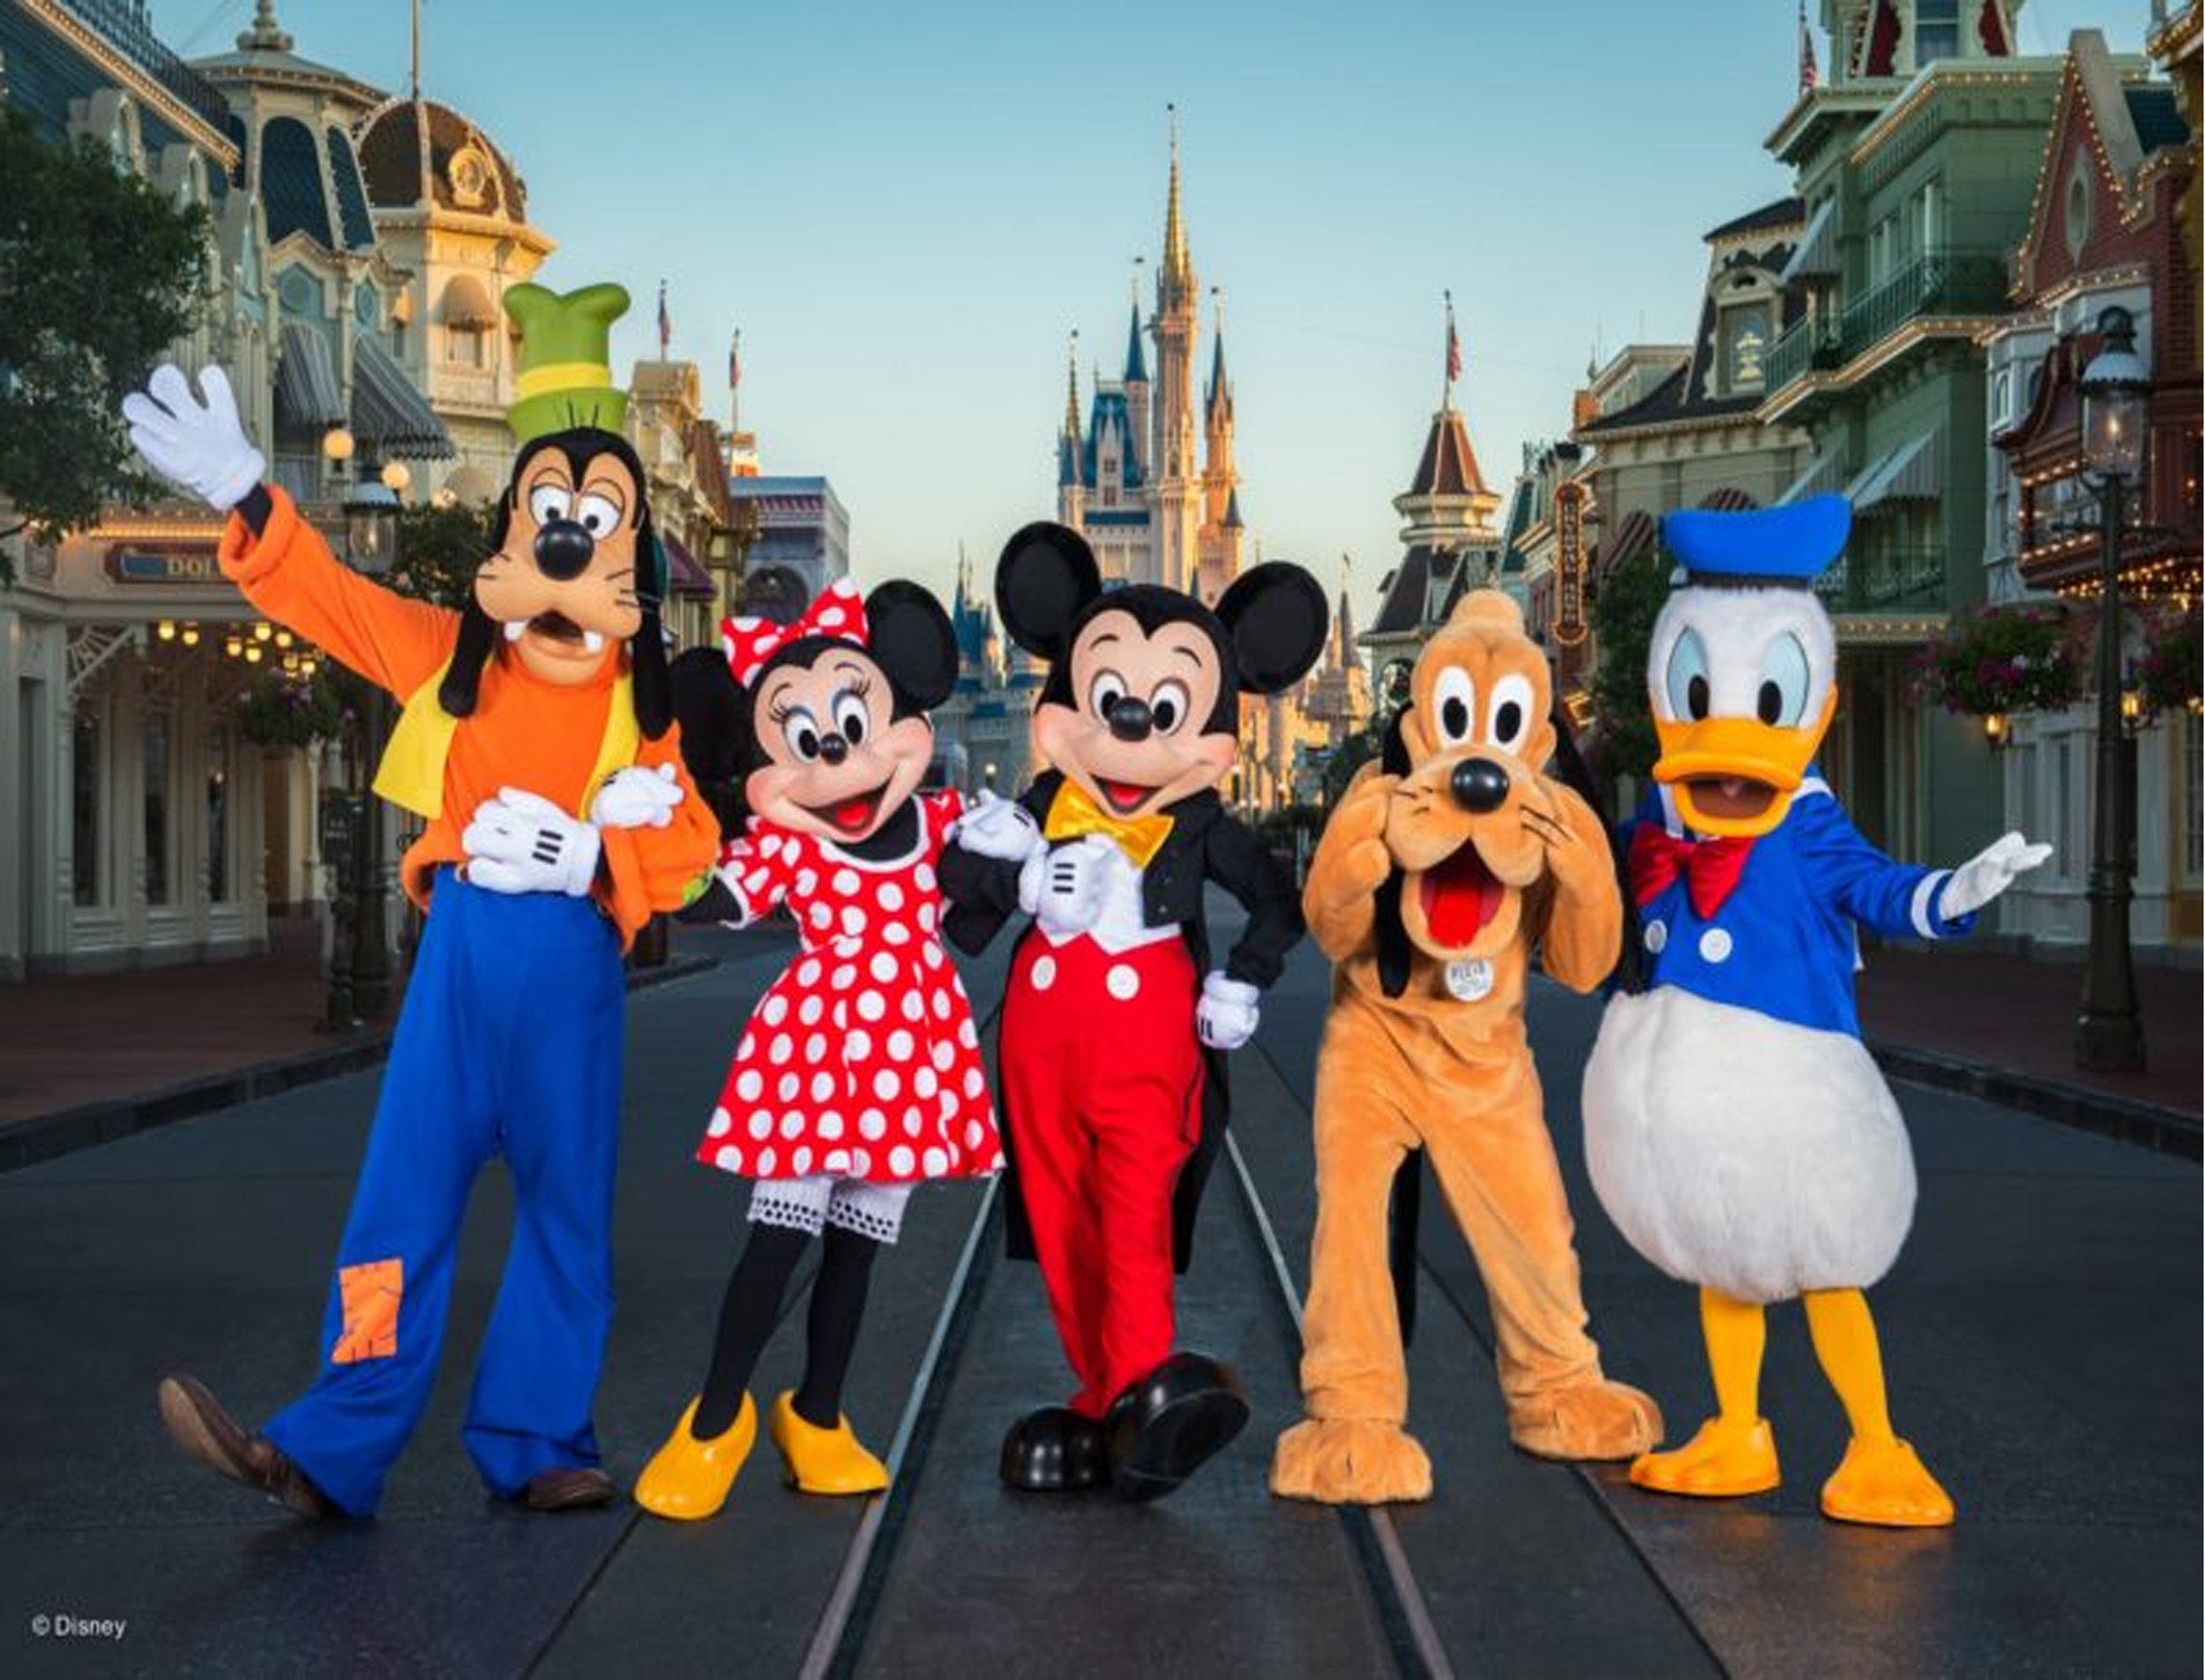 Disneyworldpic.jpg